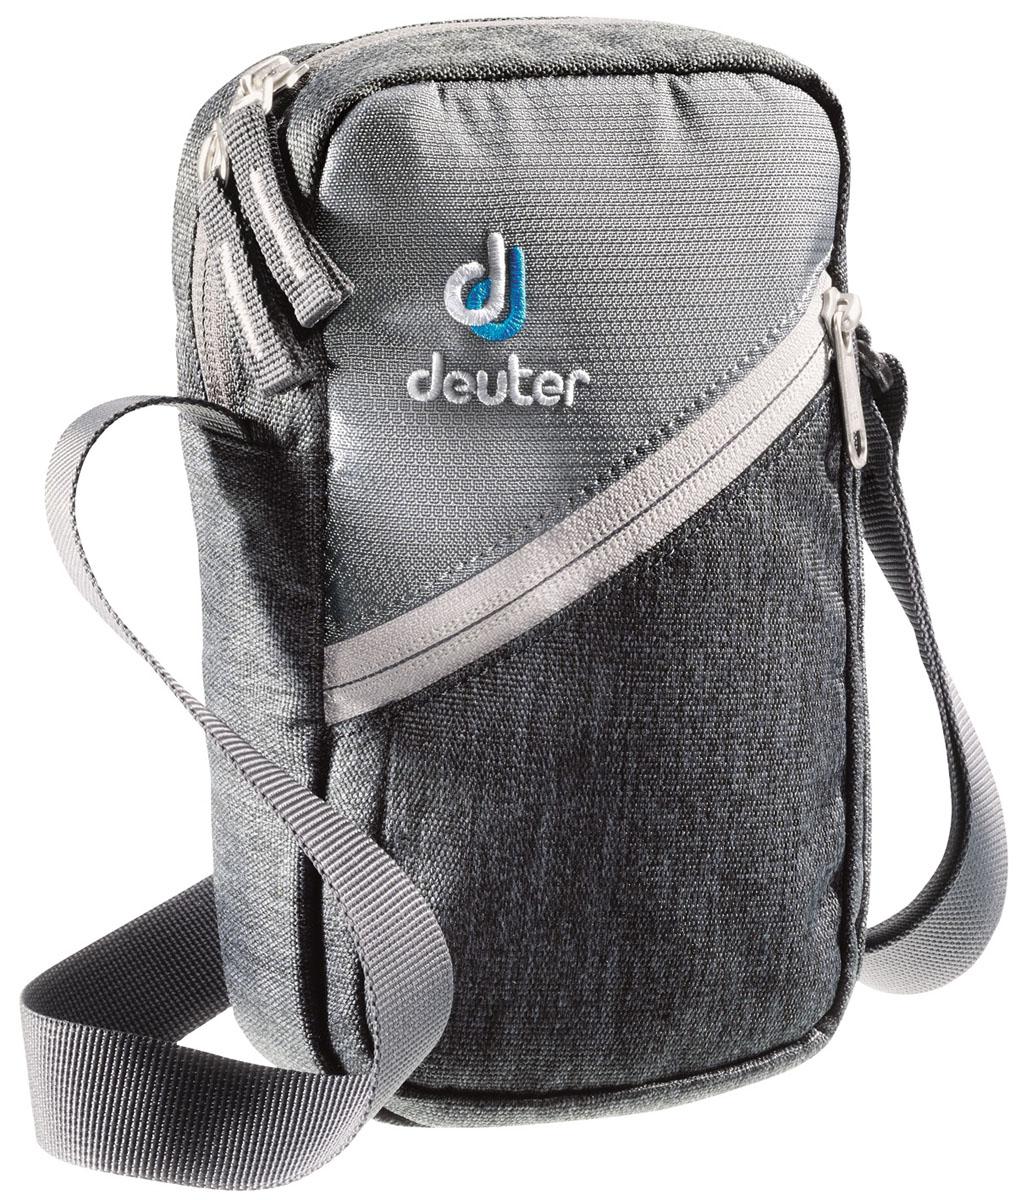 Сумка на плечо Deuter 2015 Shoulder bags Escape I, цвет: серый, 1л сумки deuter сумка на плечо deuter 2016 17 tommy s dresscode black